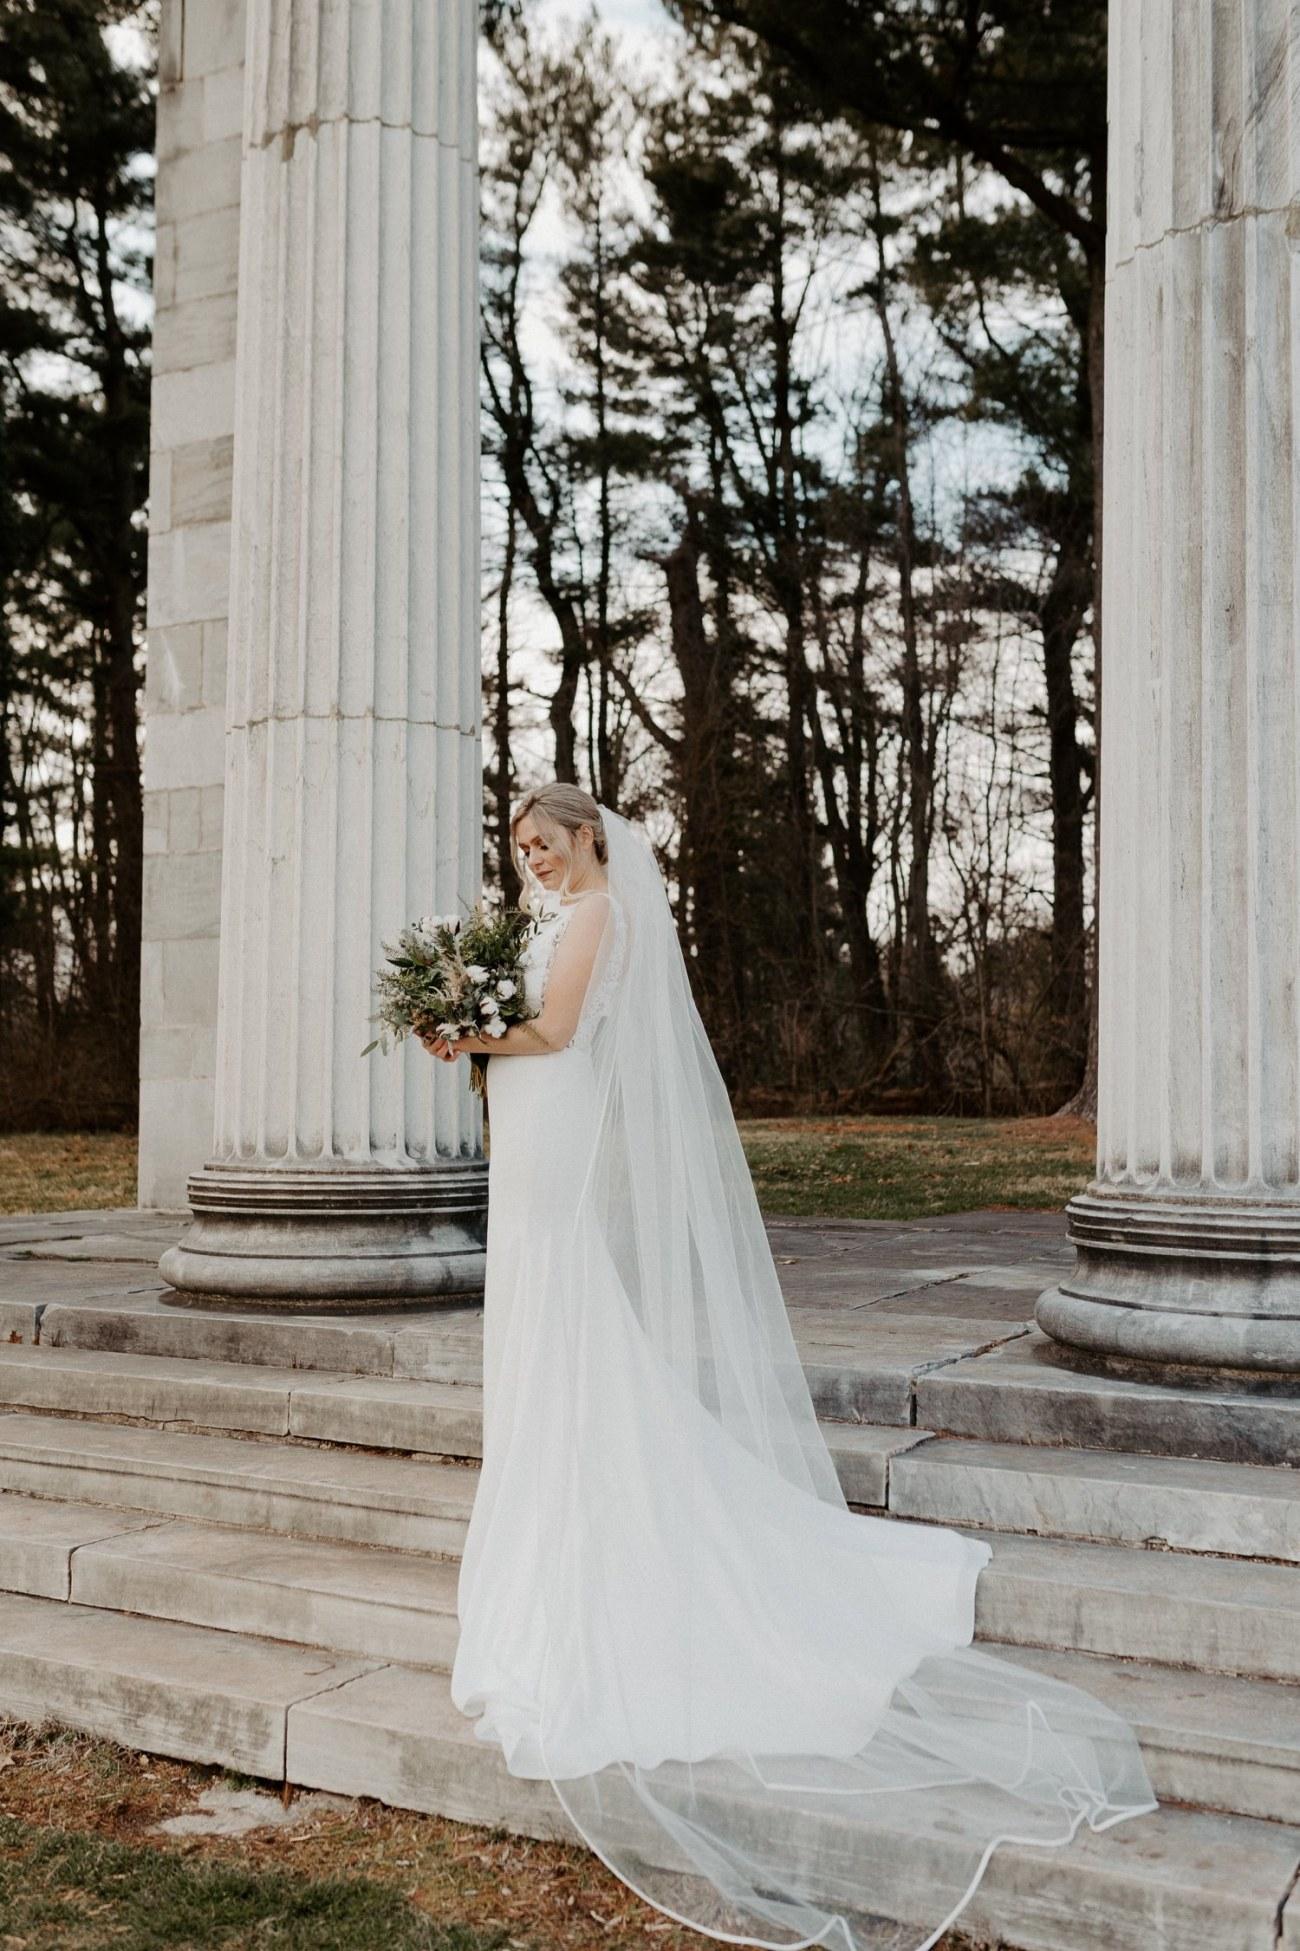 Princeton Battlefield Wedding Princeton University Elopement New Jersey Wedding Photographer Anais Possamai Photography 23